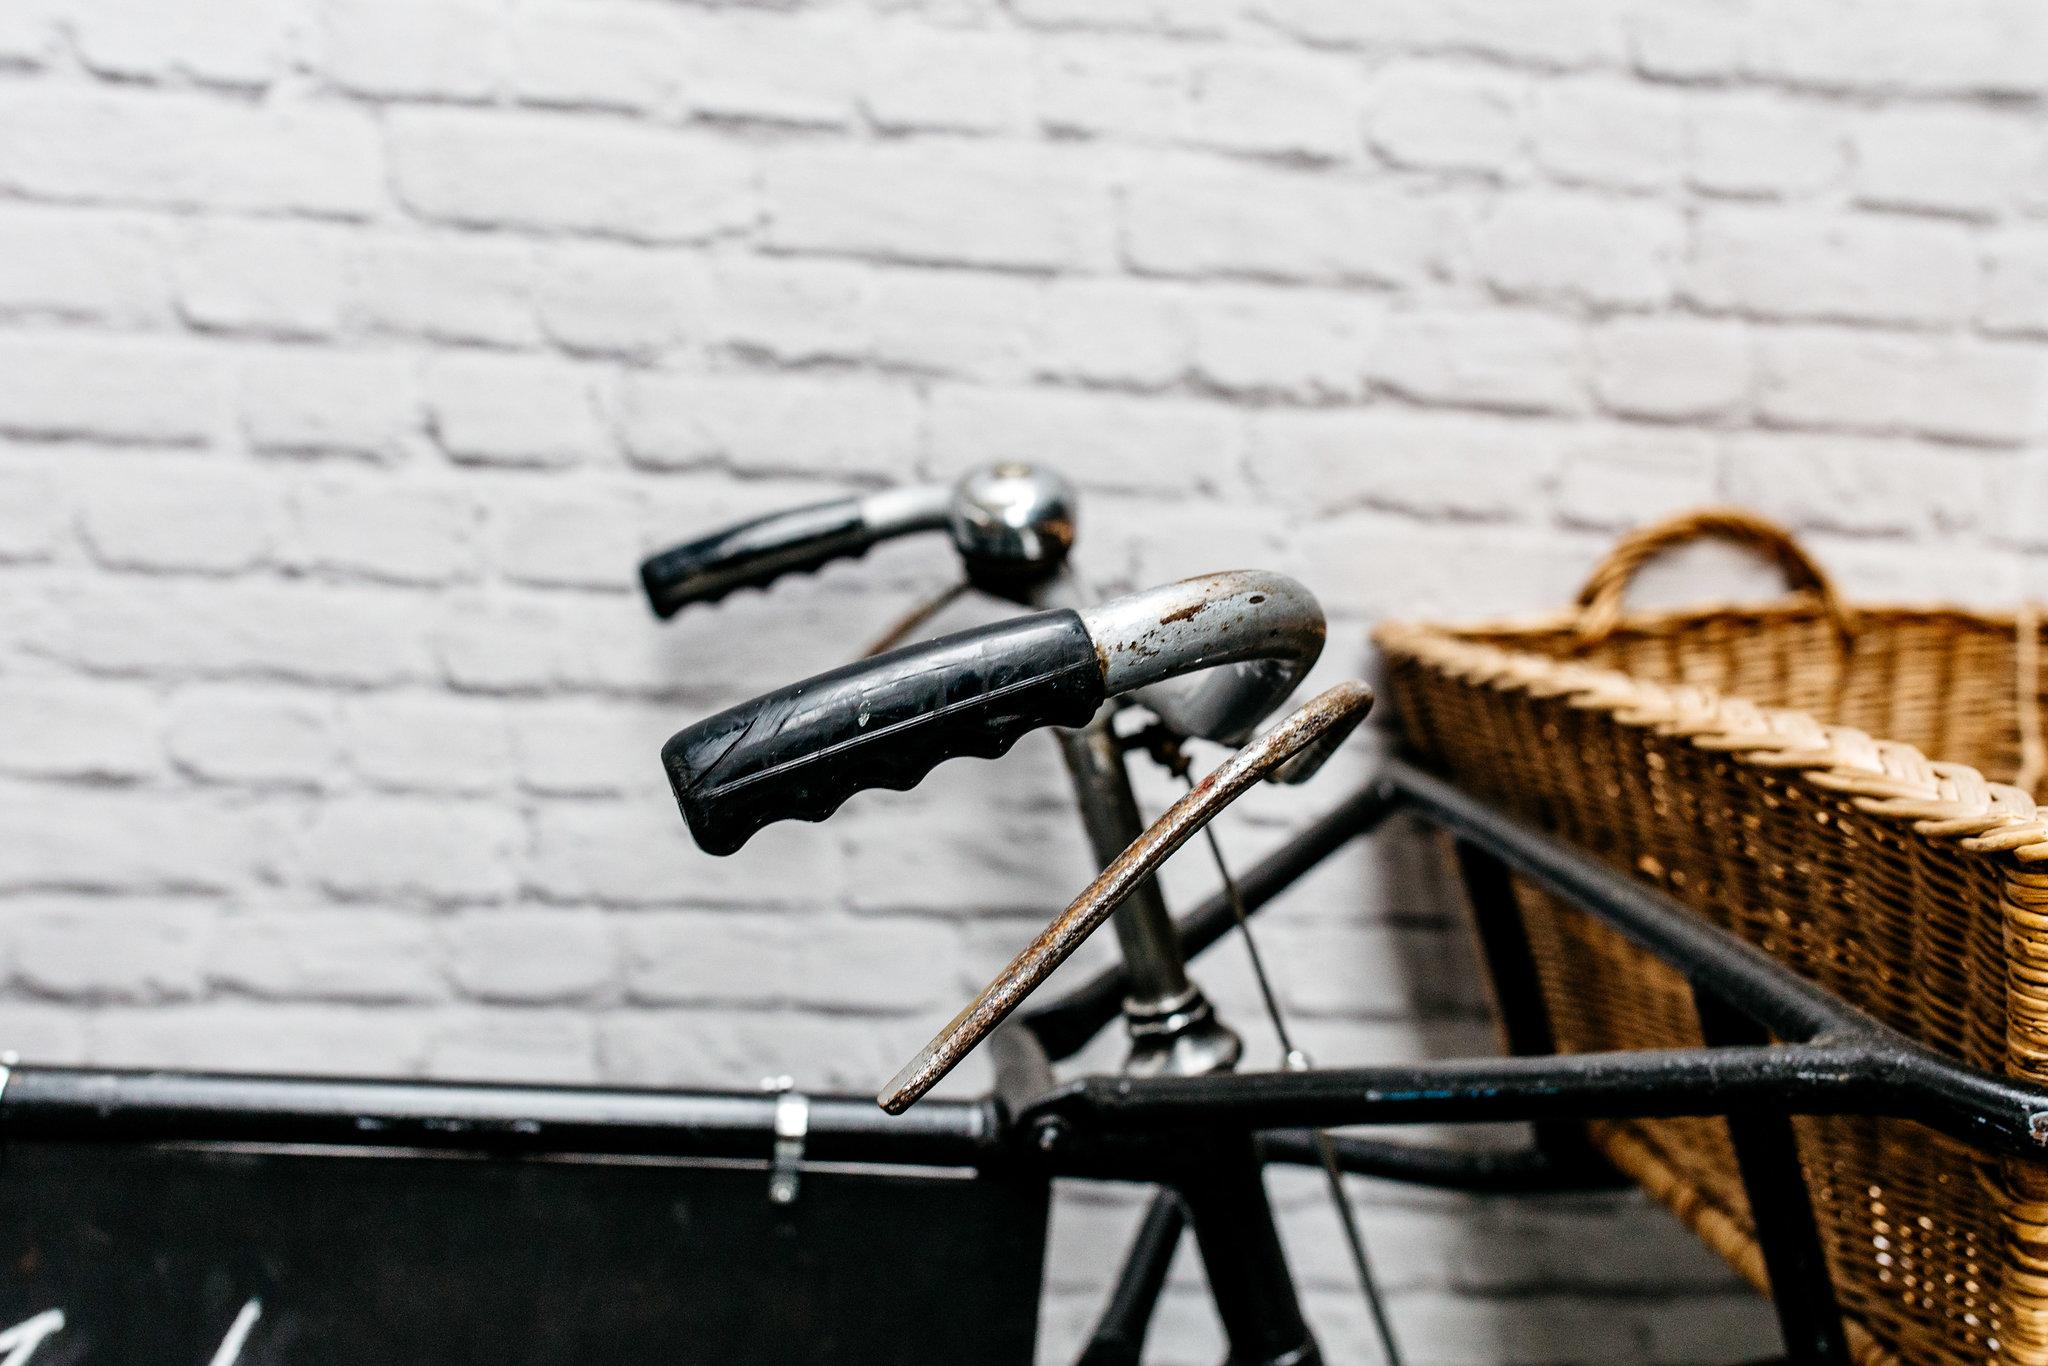 Vintage Pashley Bike